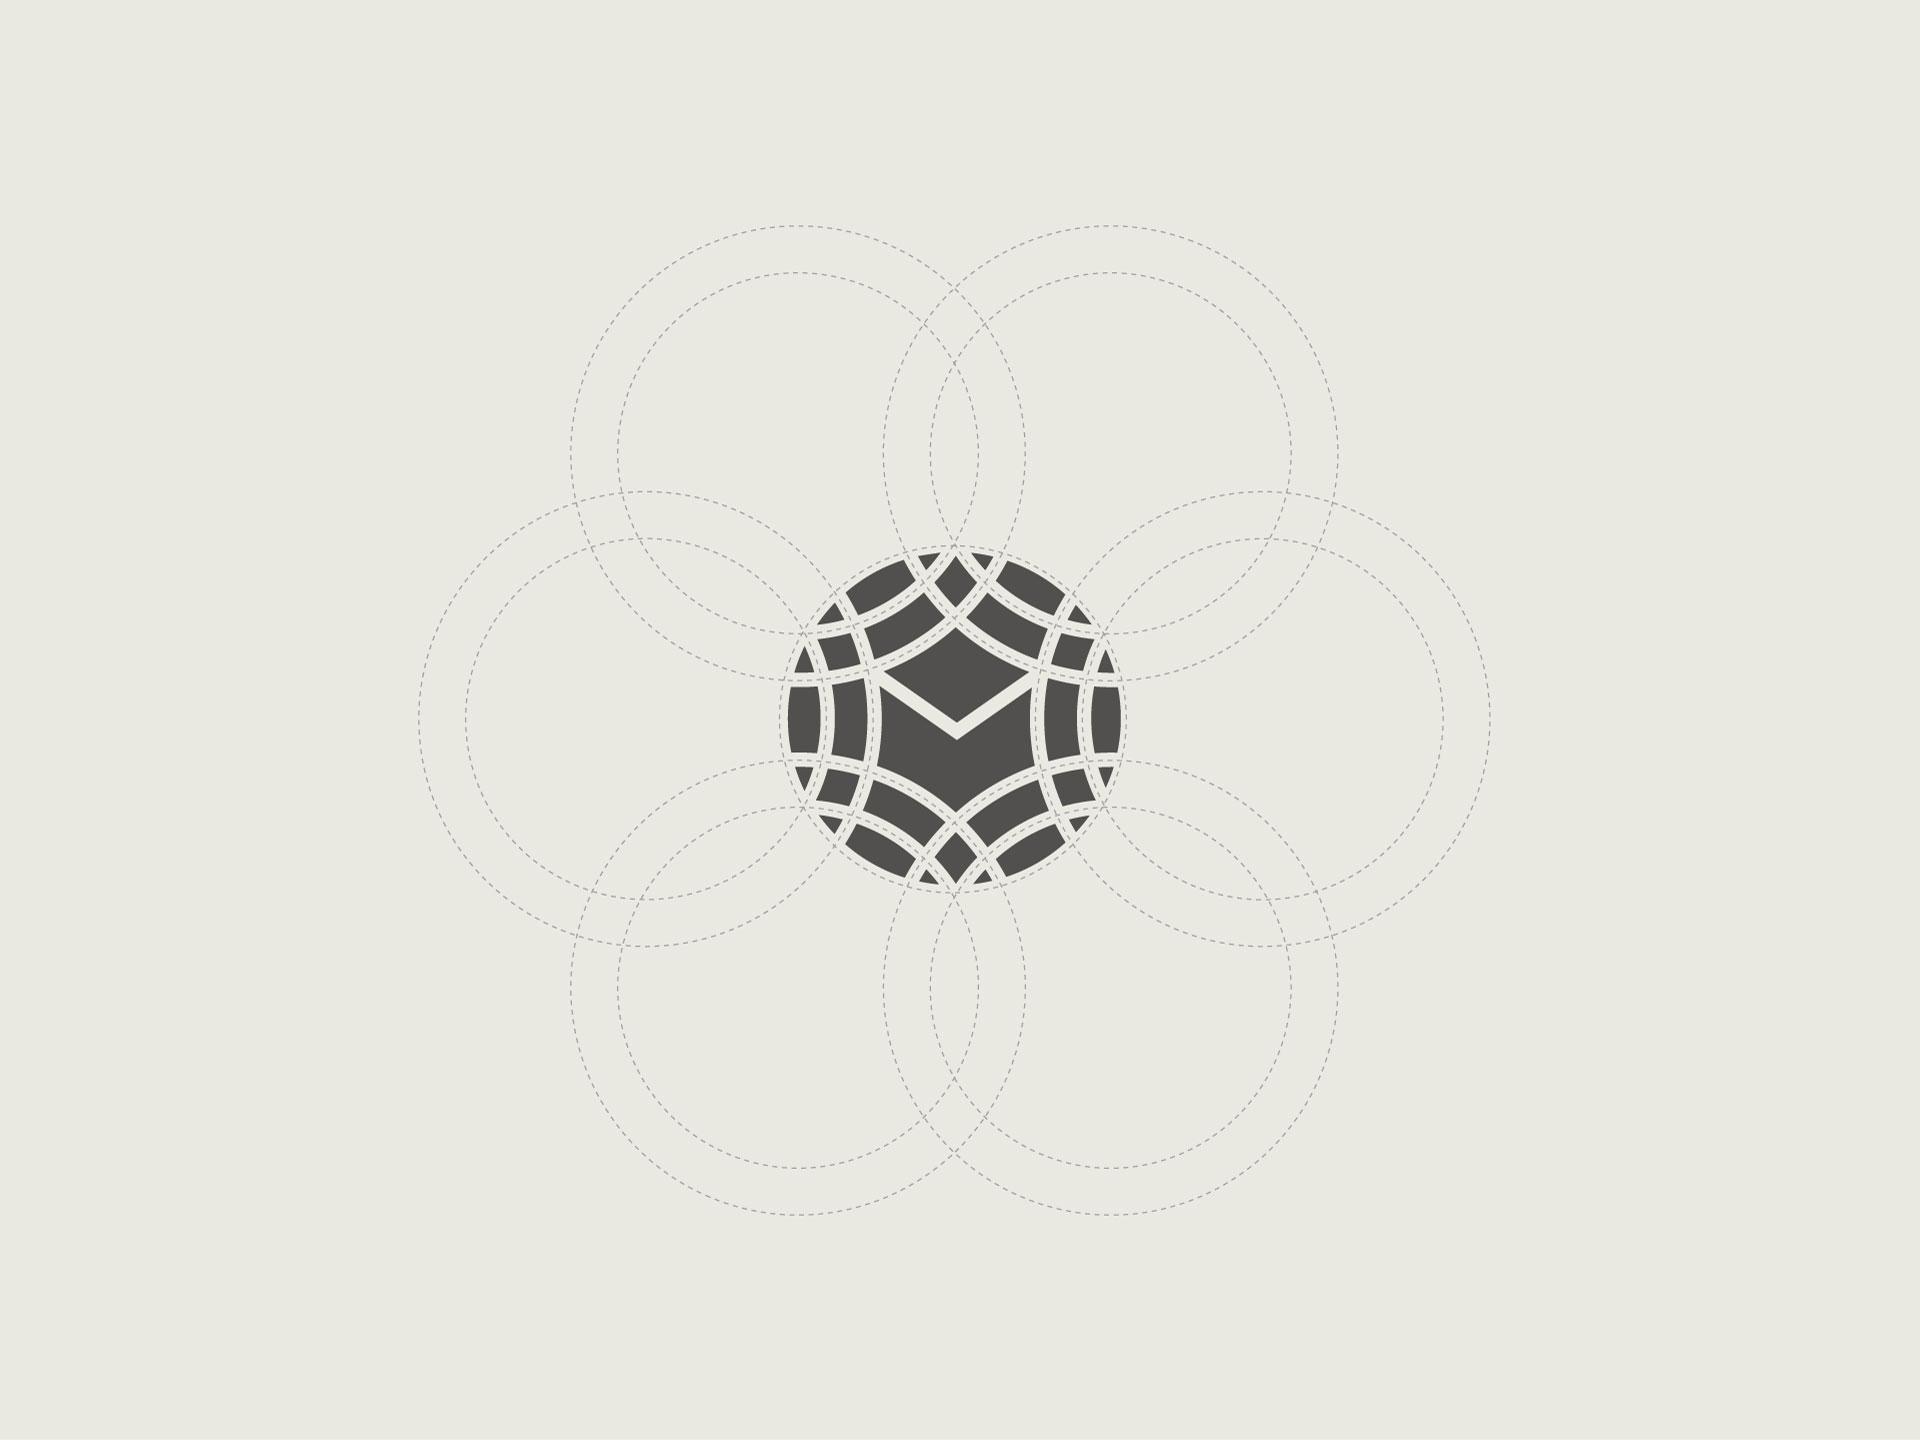 jewellery branding by Z Creative Studio Branding & Graphic Design Melbourne